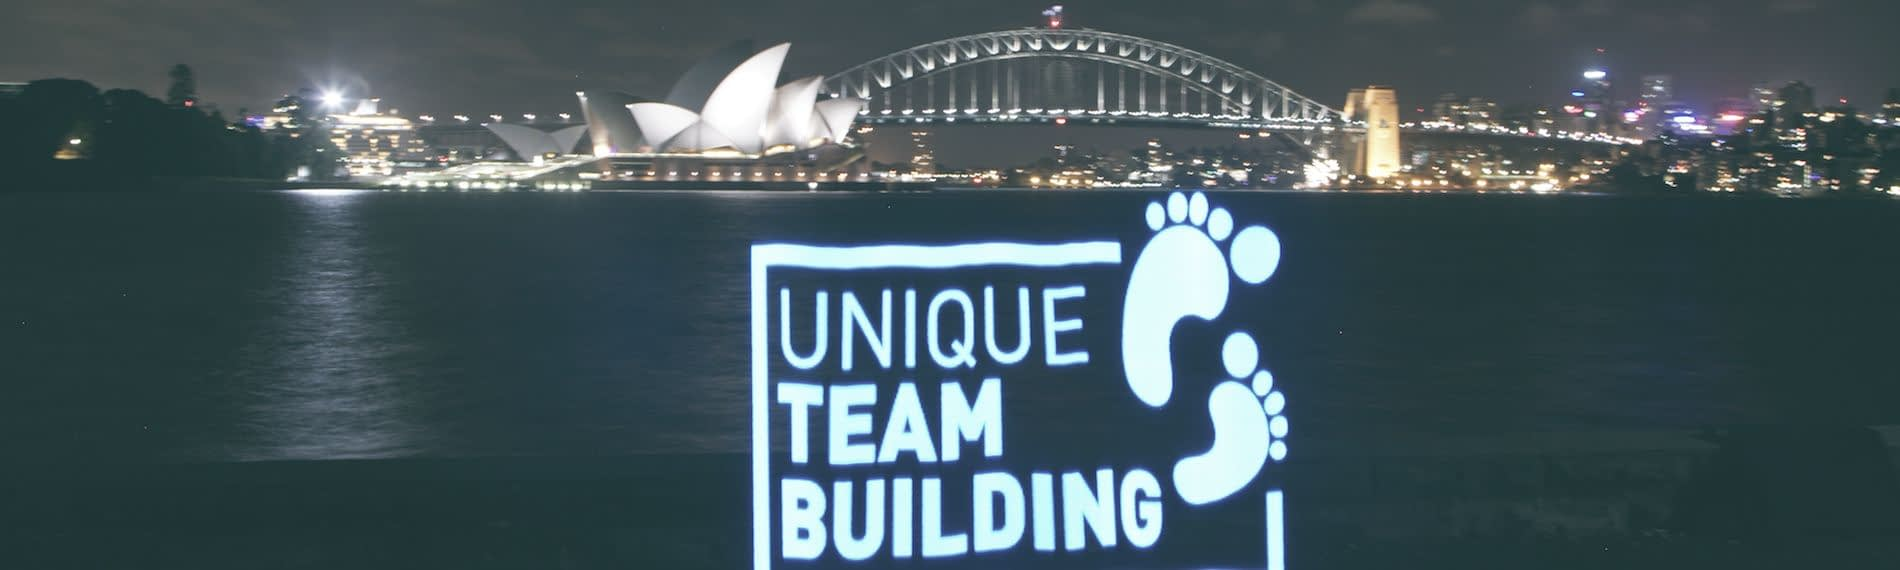 https://mlcb8szwyxfv.i.optimole.com/tTCGqh8-hoo68Ngz/w:auto/h:auto/q:auto/https://www.uniqueteambuilding.com.au/wp-content/uploads/2015/01/team-building-default-rot-1.jpg